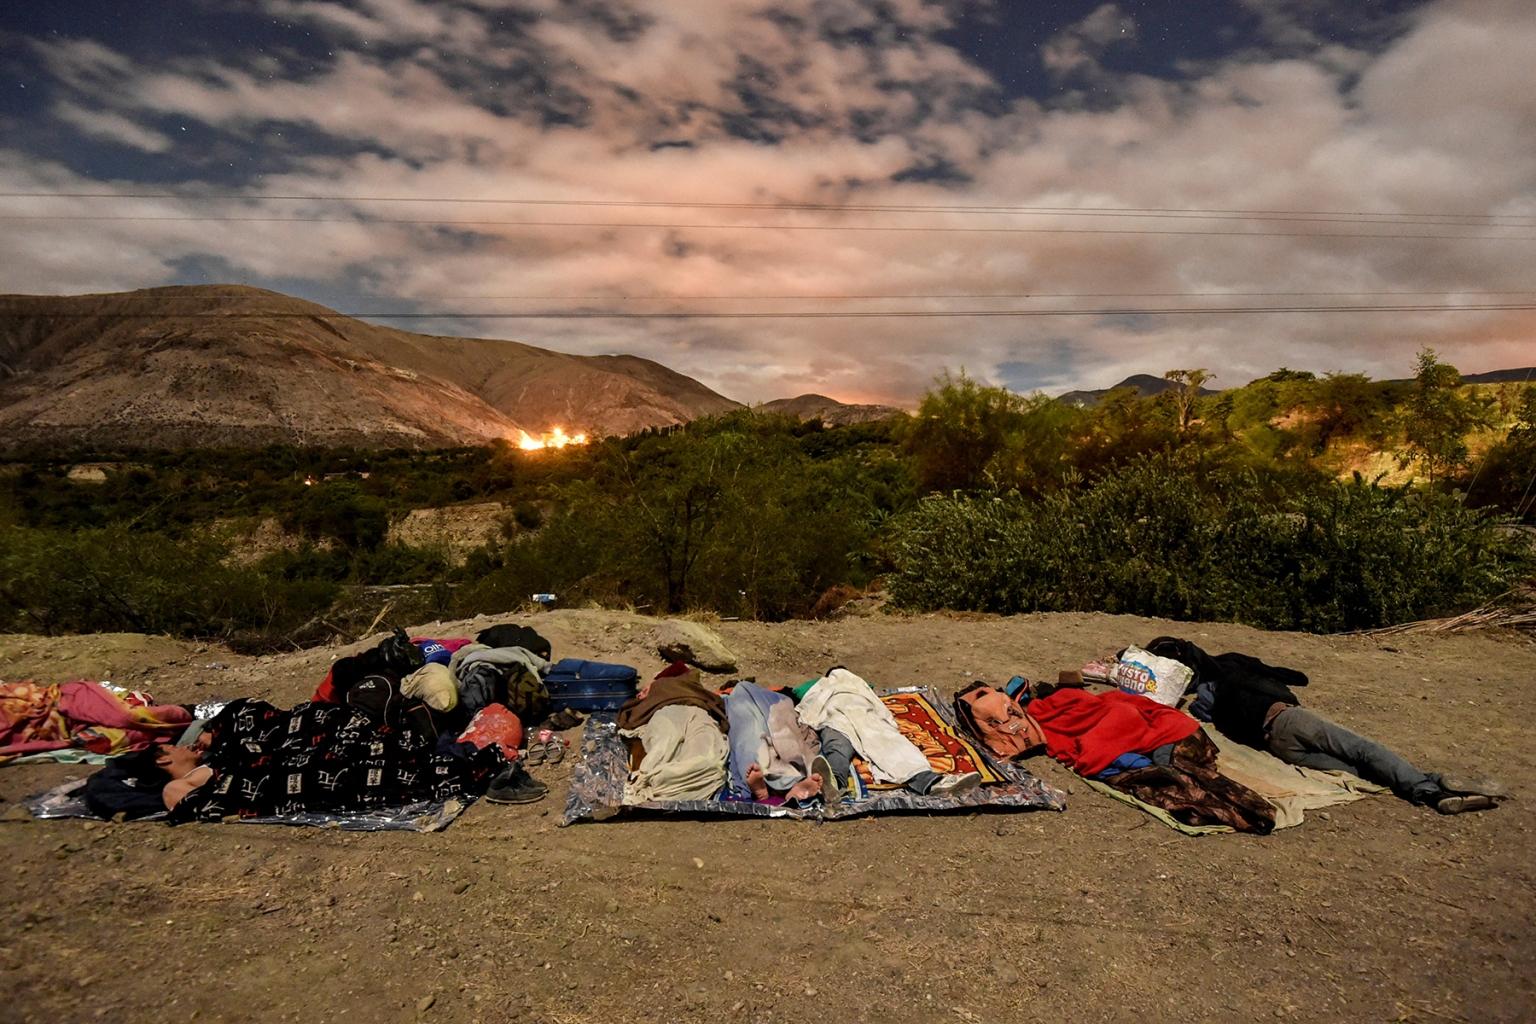 Venezuelan migrants on their way to Peru sleep along the Pan-American Highway between Tulcan and Ibarra in Ecuador on Aug. 22. LUIS ROBAYO/AFP/Getty Images